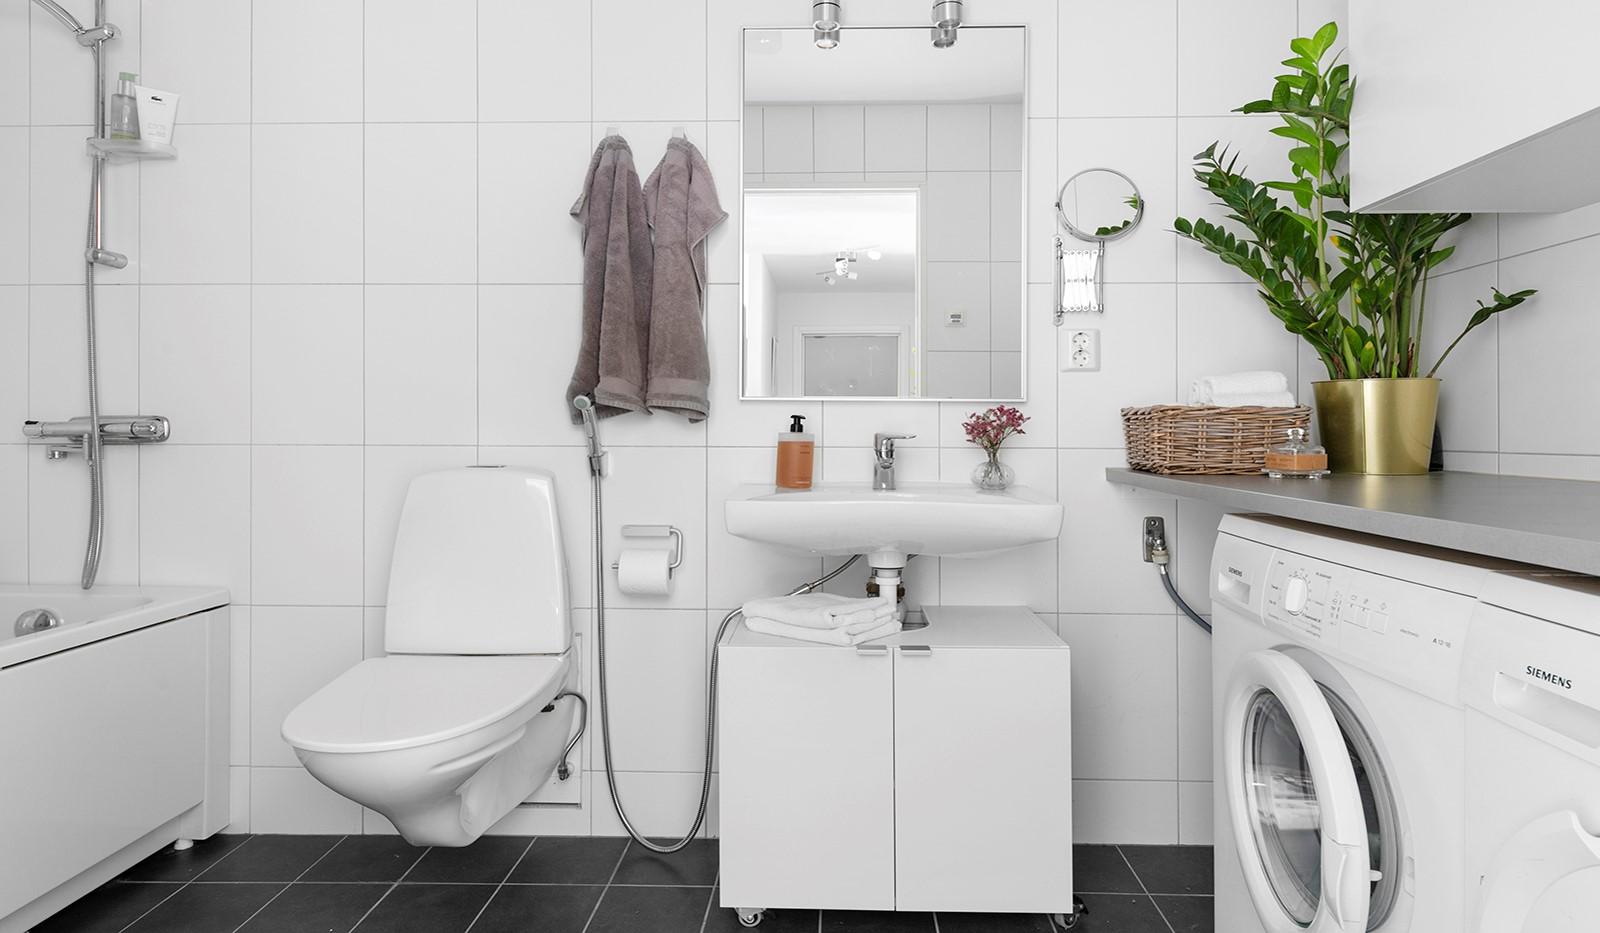 Marieviksgatan 44, 2 tr - Stilrent och modernt badrum